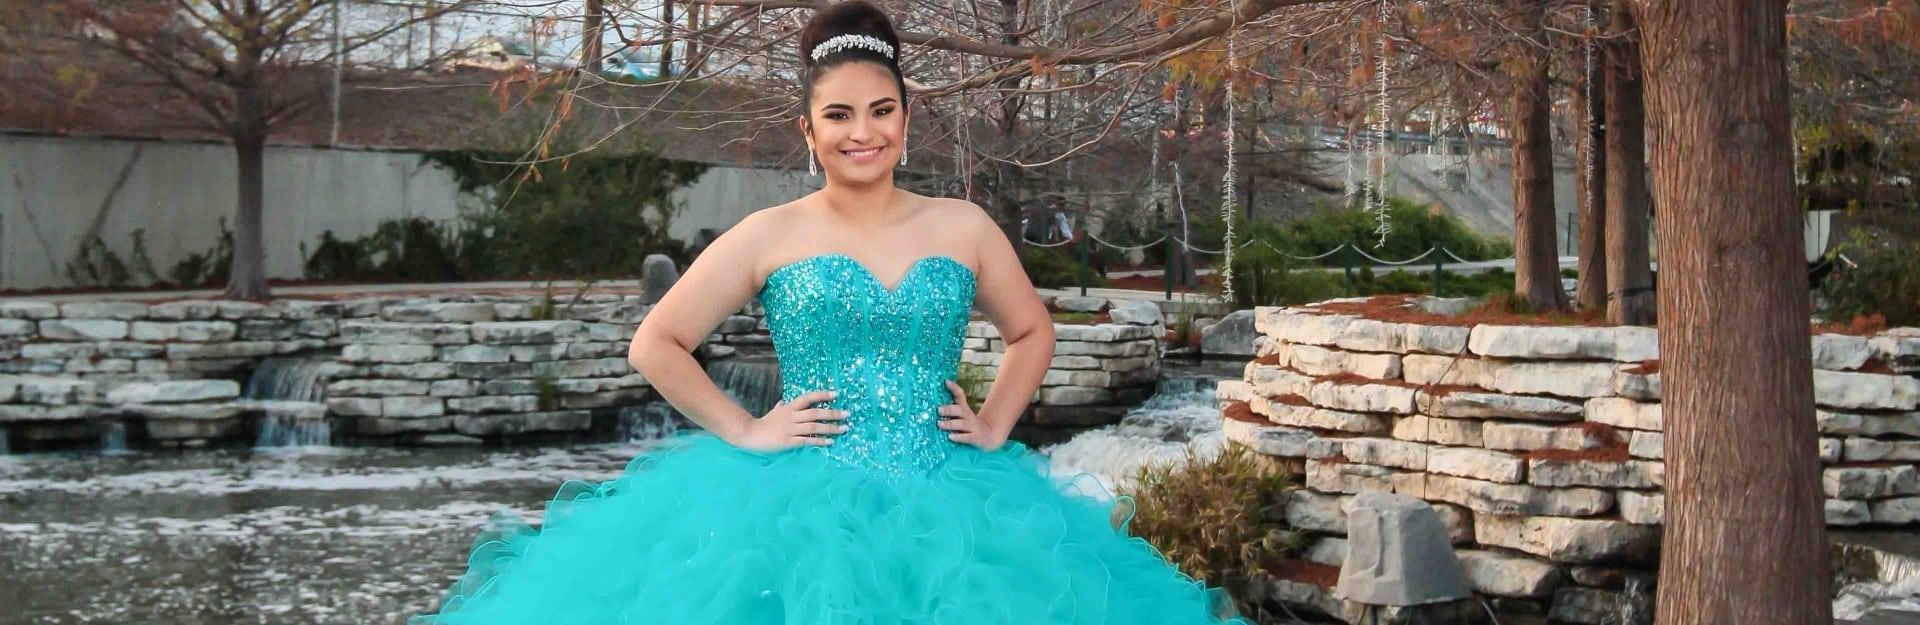 Teen Events, Quinceaneras, Prom, Graduation, Senior Photos-3